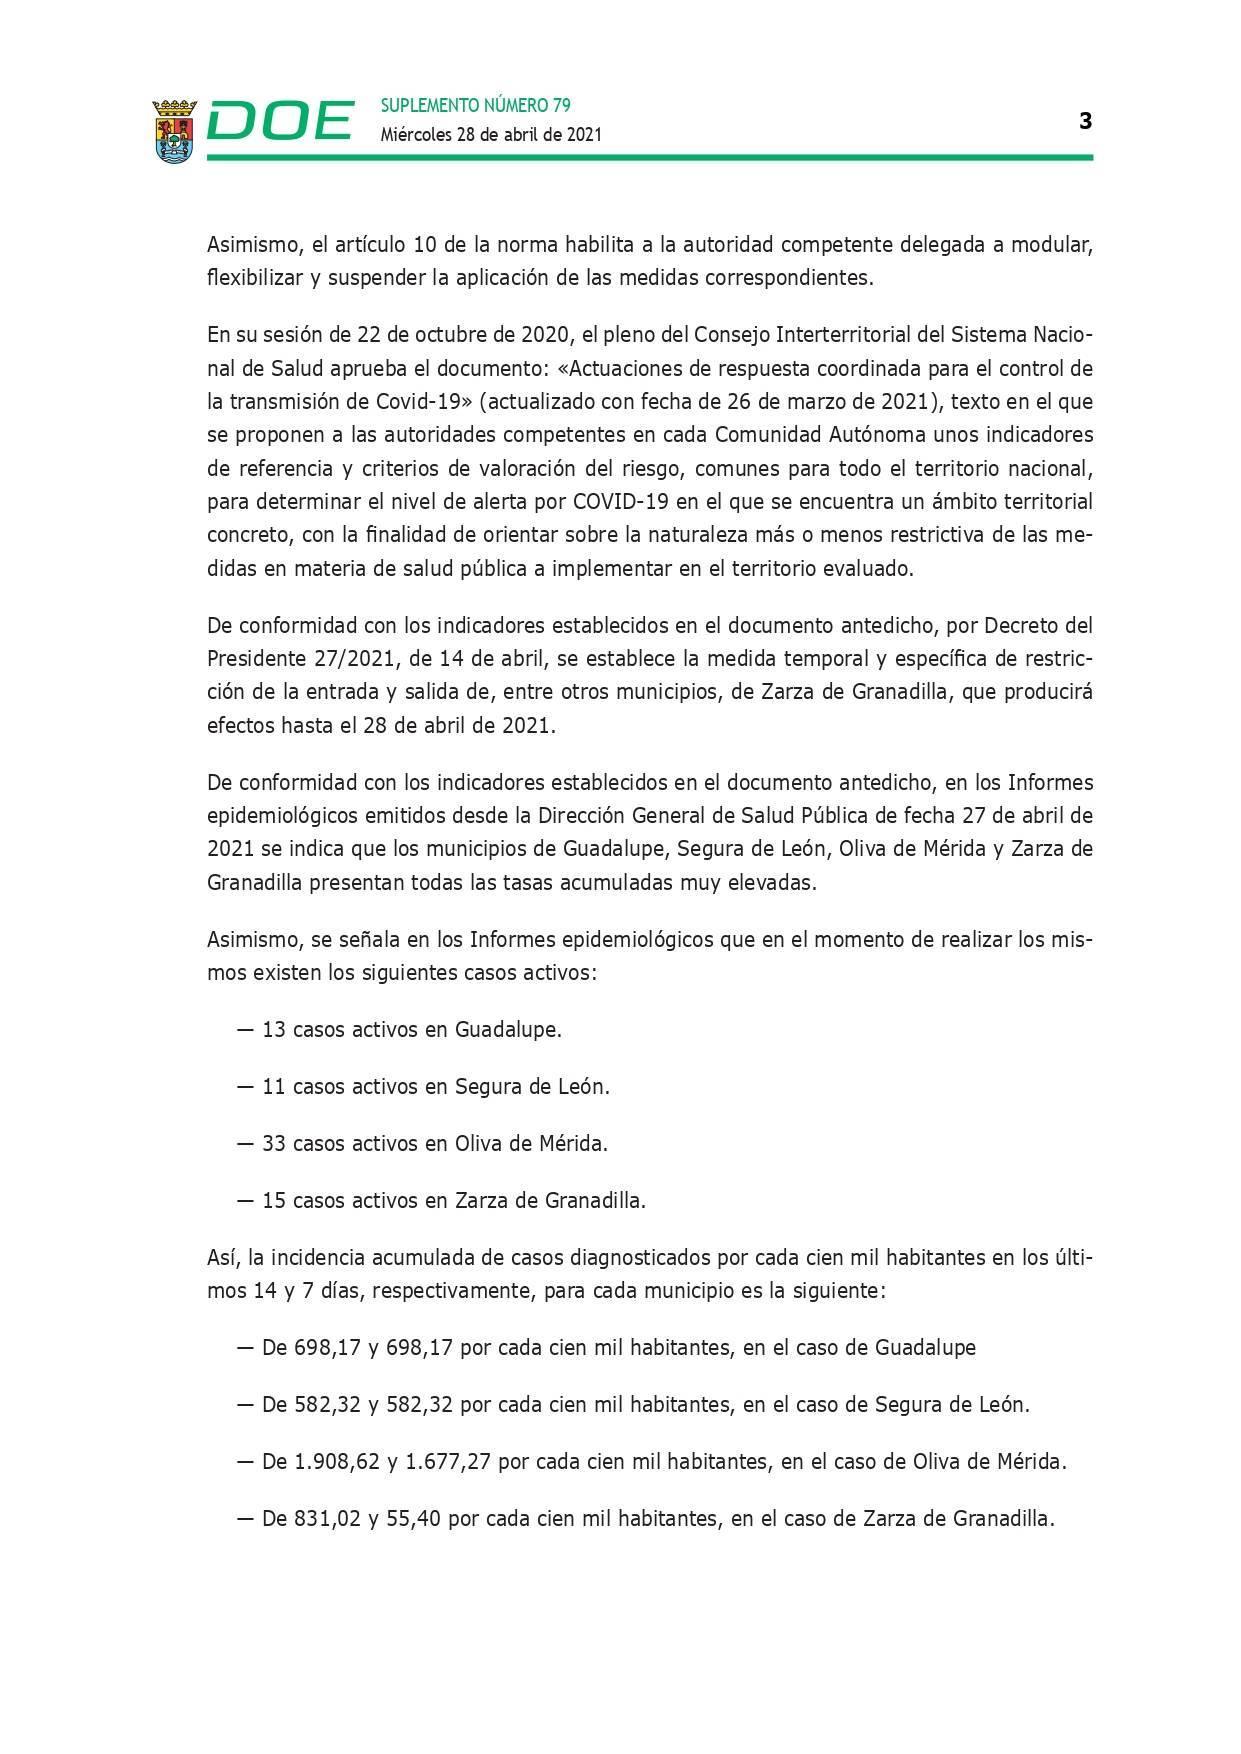 Cierre perimetral por COVID-19 (abril 2021) - Guadalupe (Cáceres) 3